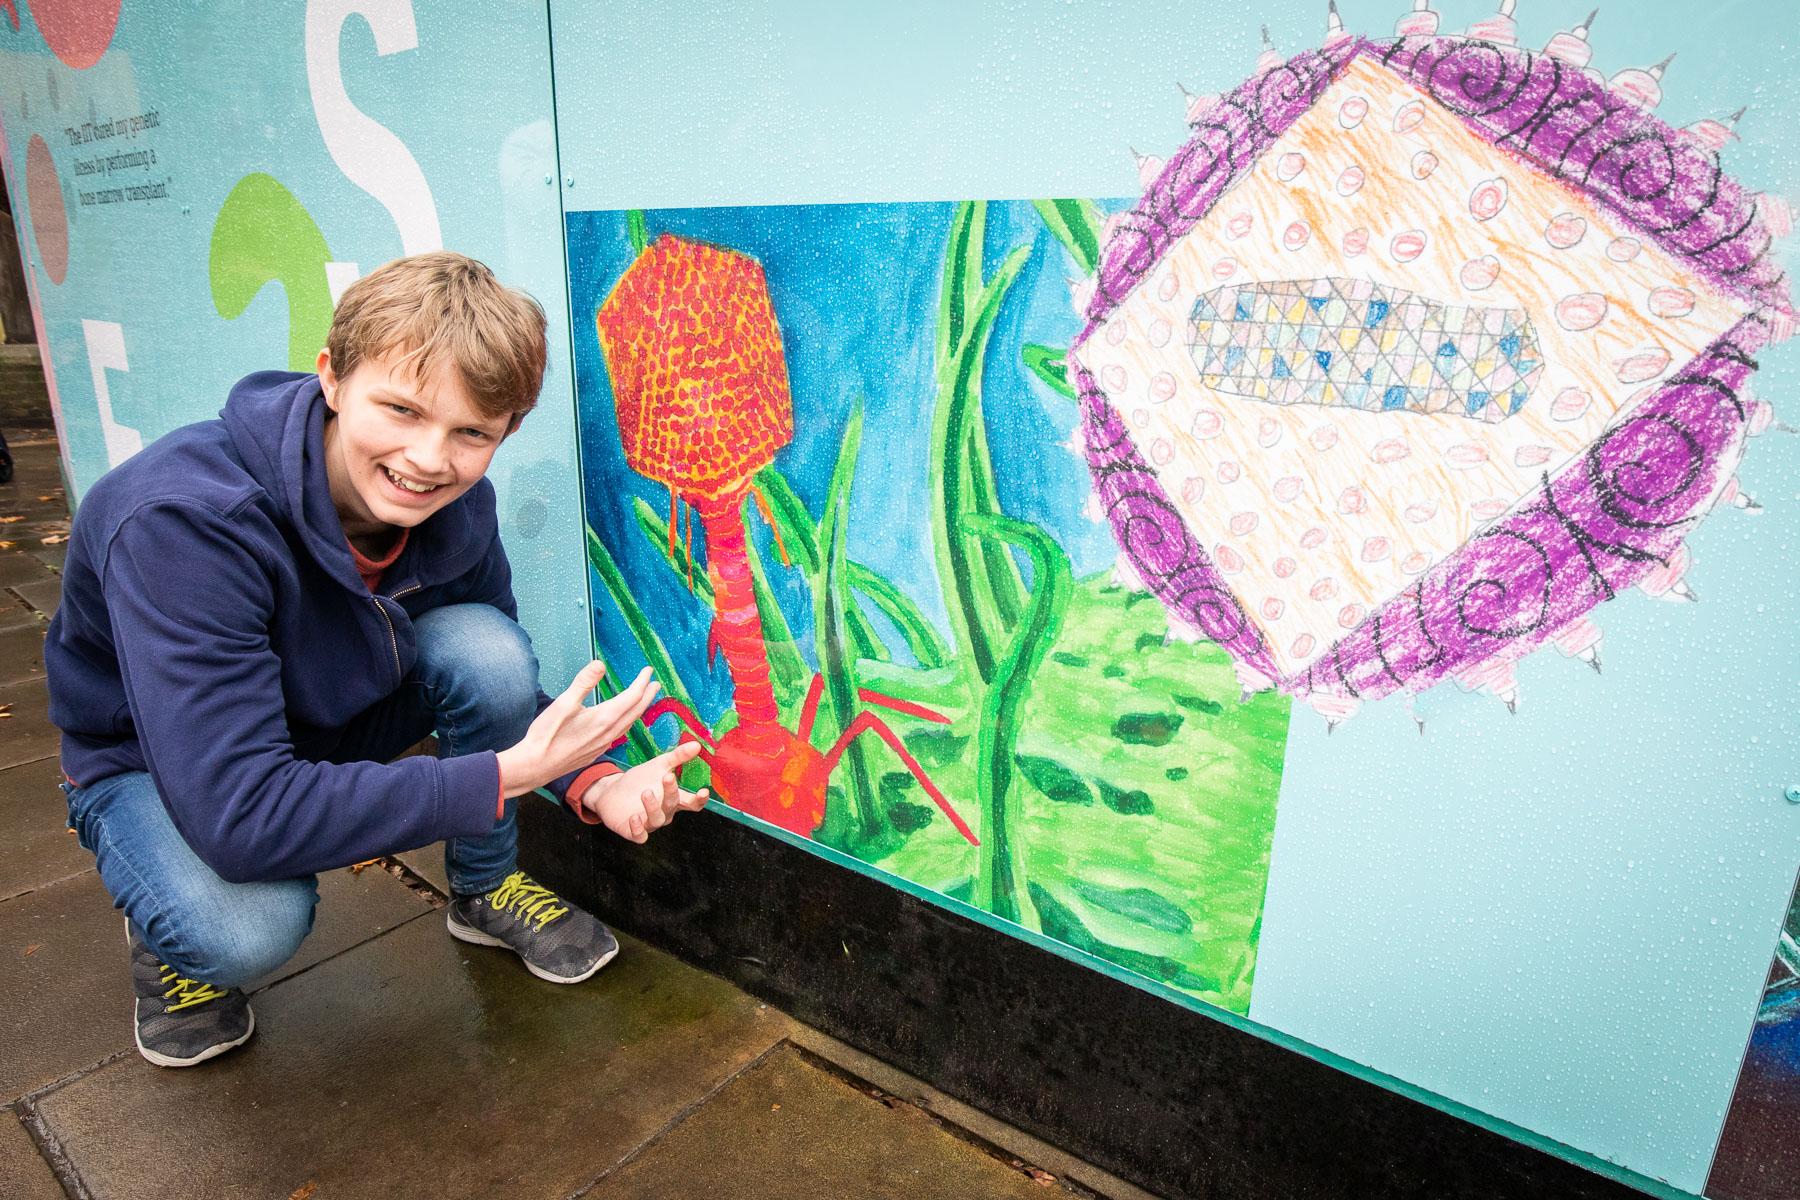 167 18_0012_RFC IIT Schools hoarding artwork 2811.jpg